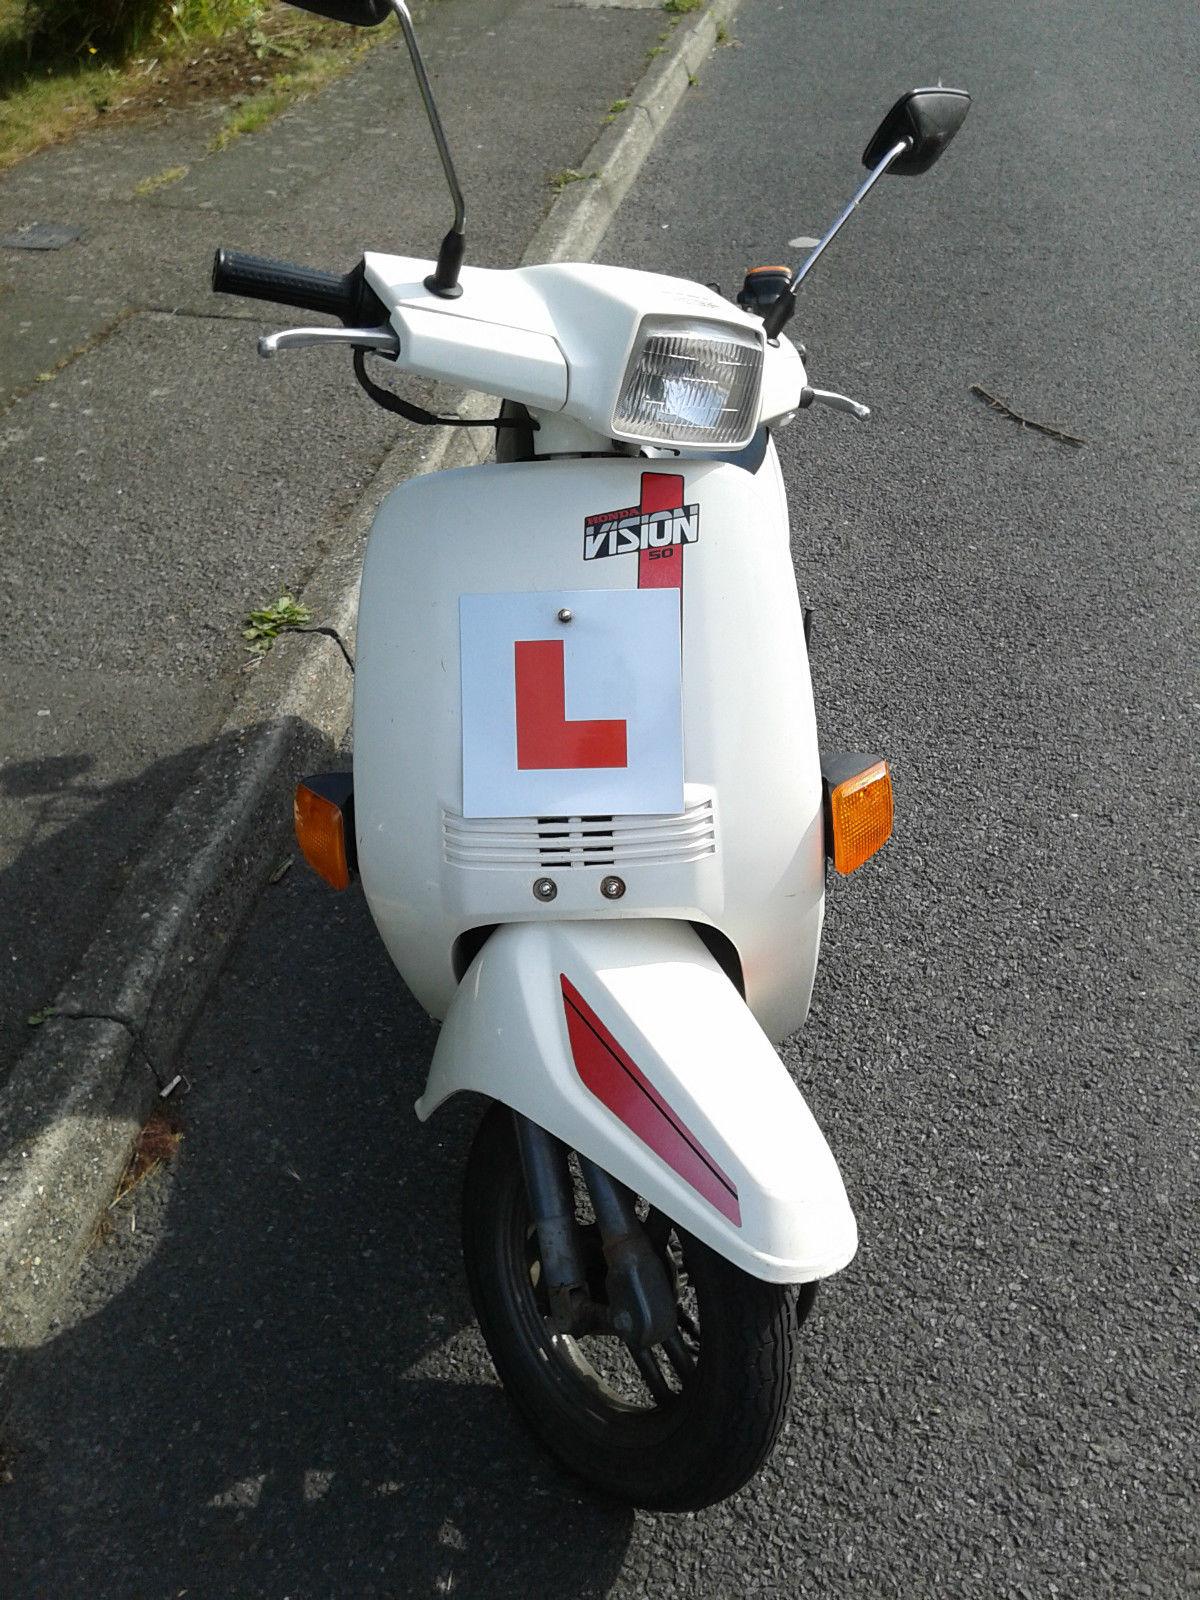 Honda Vision 50 NE50MFF Retro 90's 49cc Moped/Scooter White Automatic